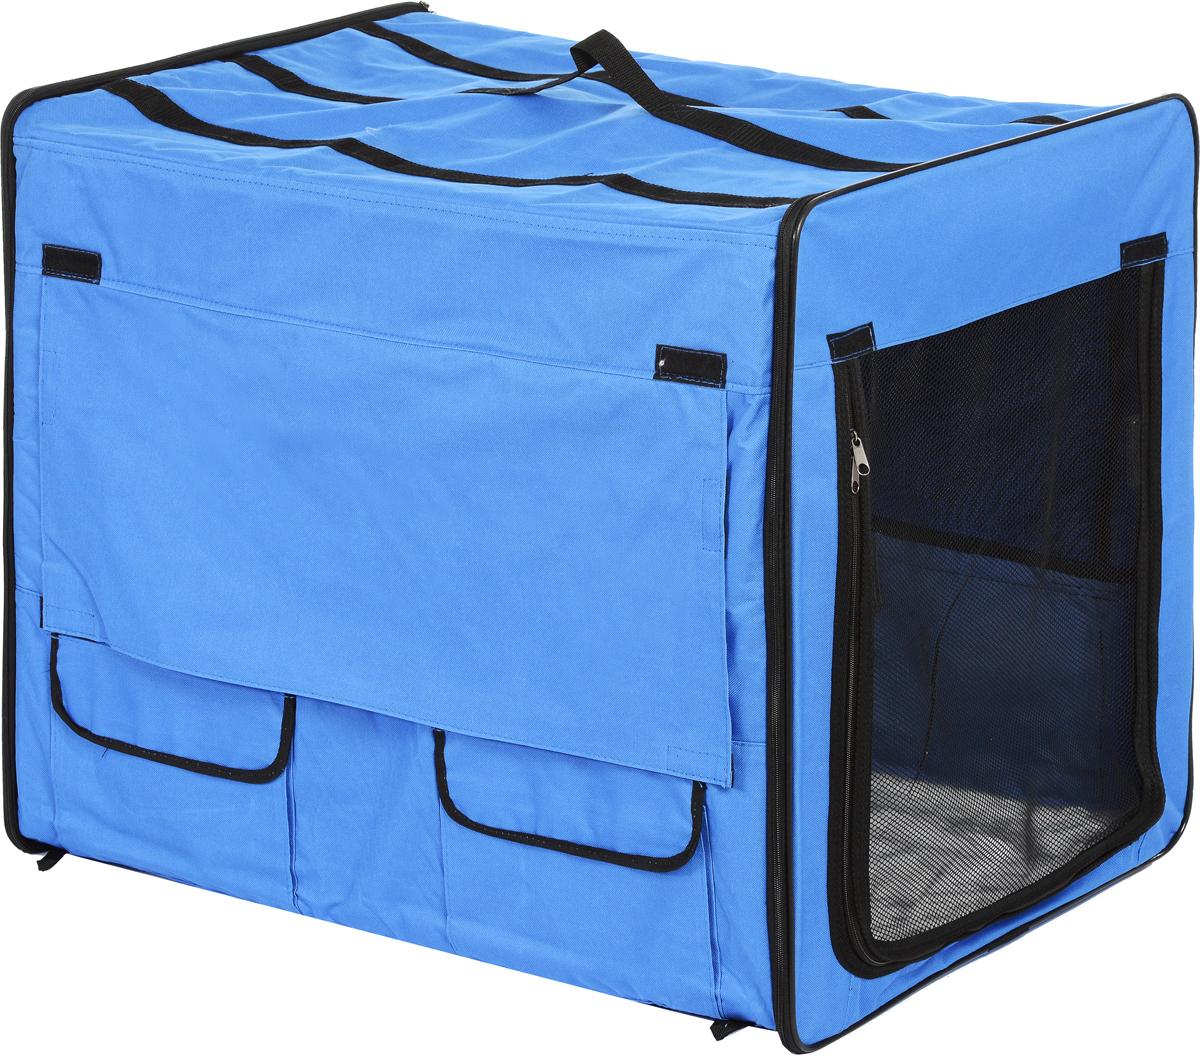 "Клетка для животных ""Заря-Плюс"", выставочная, цвет: голубой, черный, 75 х 60 х 50 см"